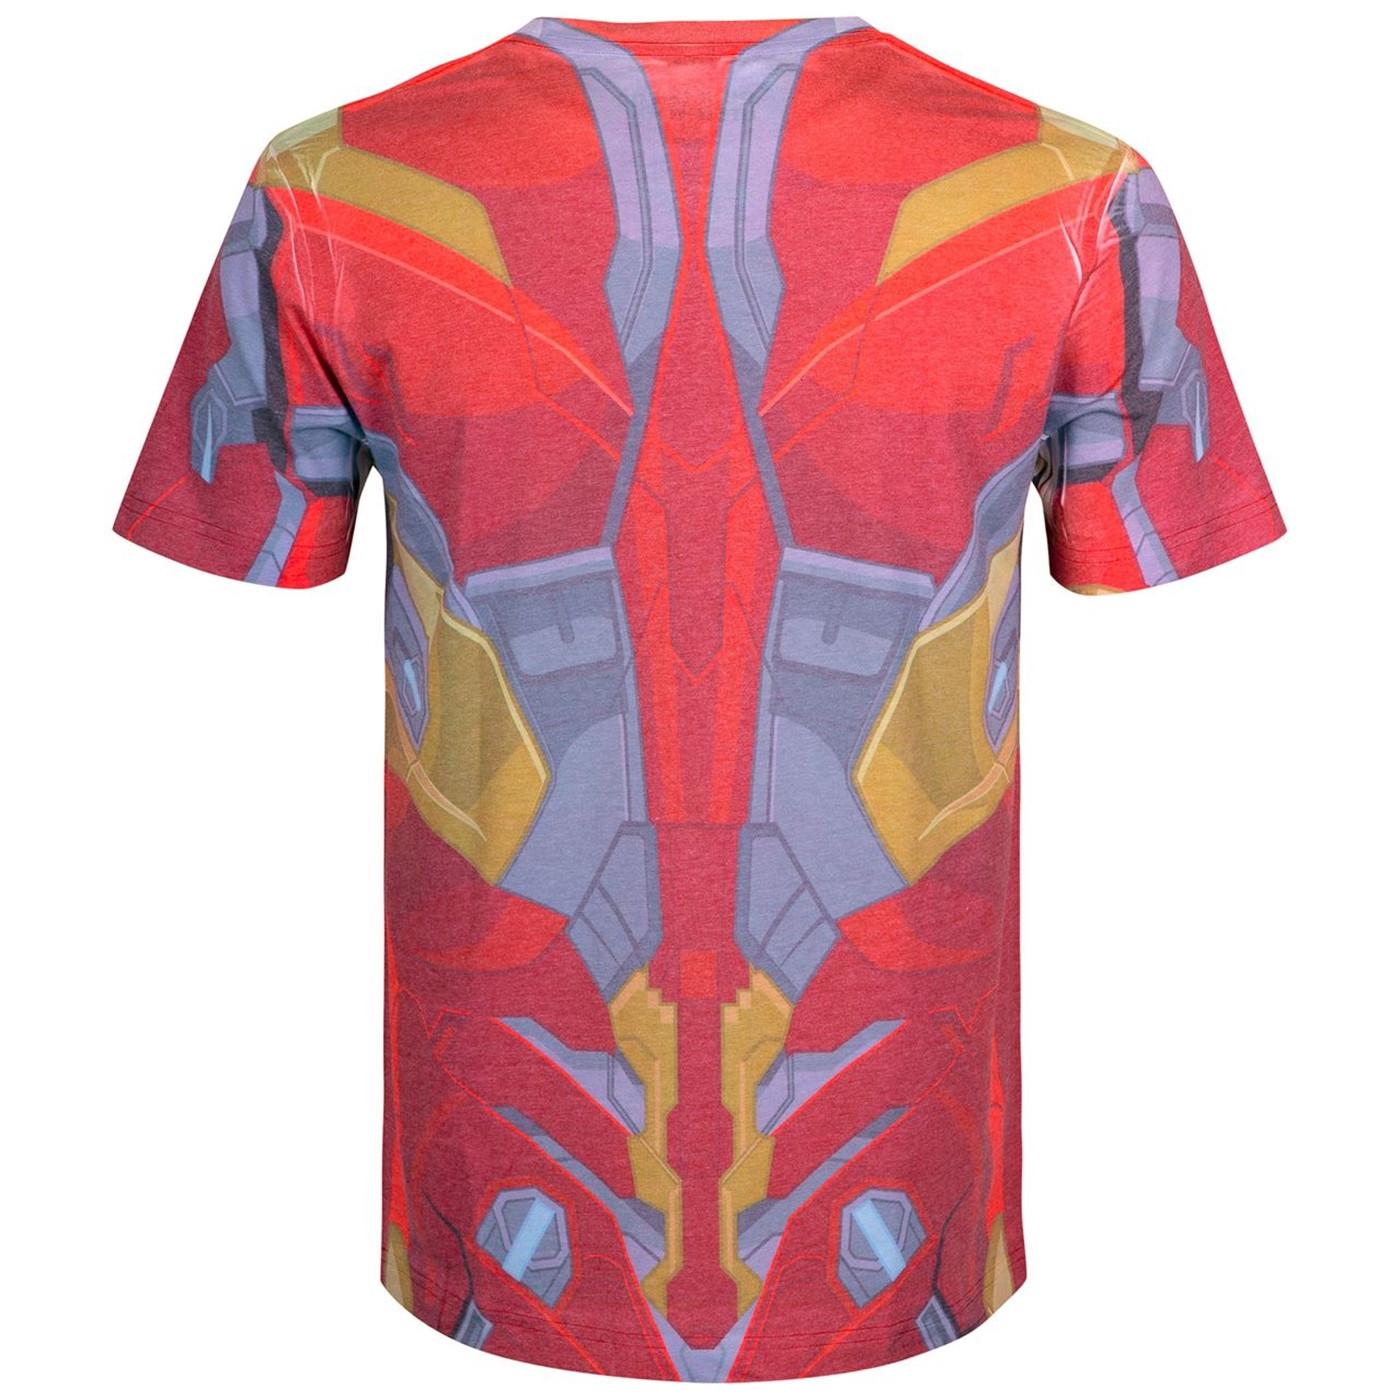 Iron Man Costume Sublimated Men's T-Shirt